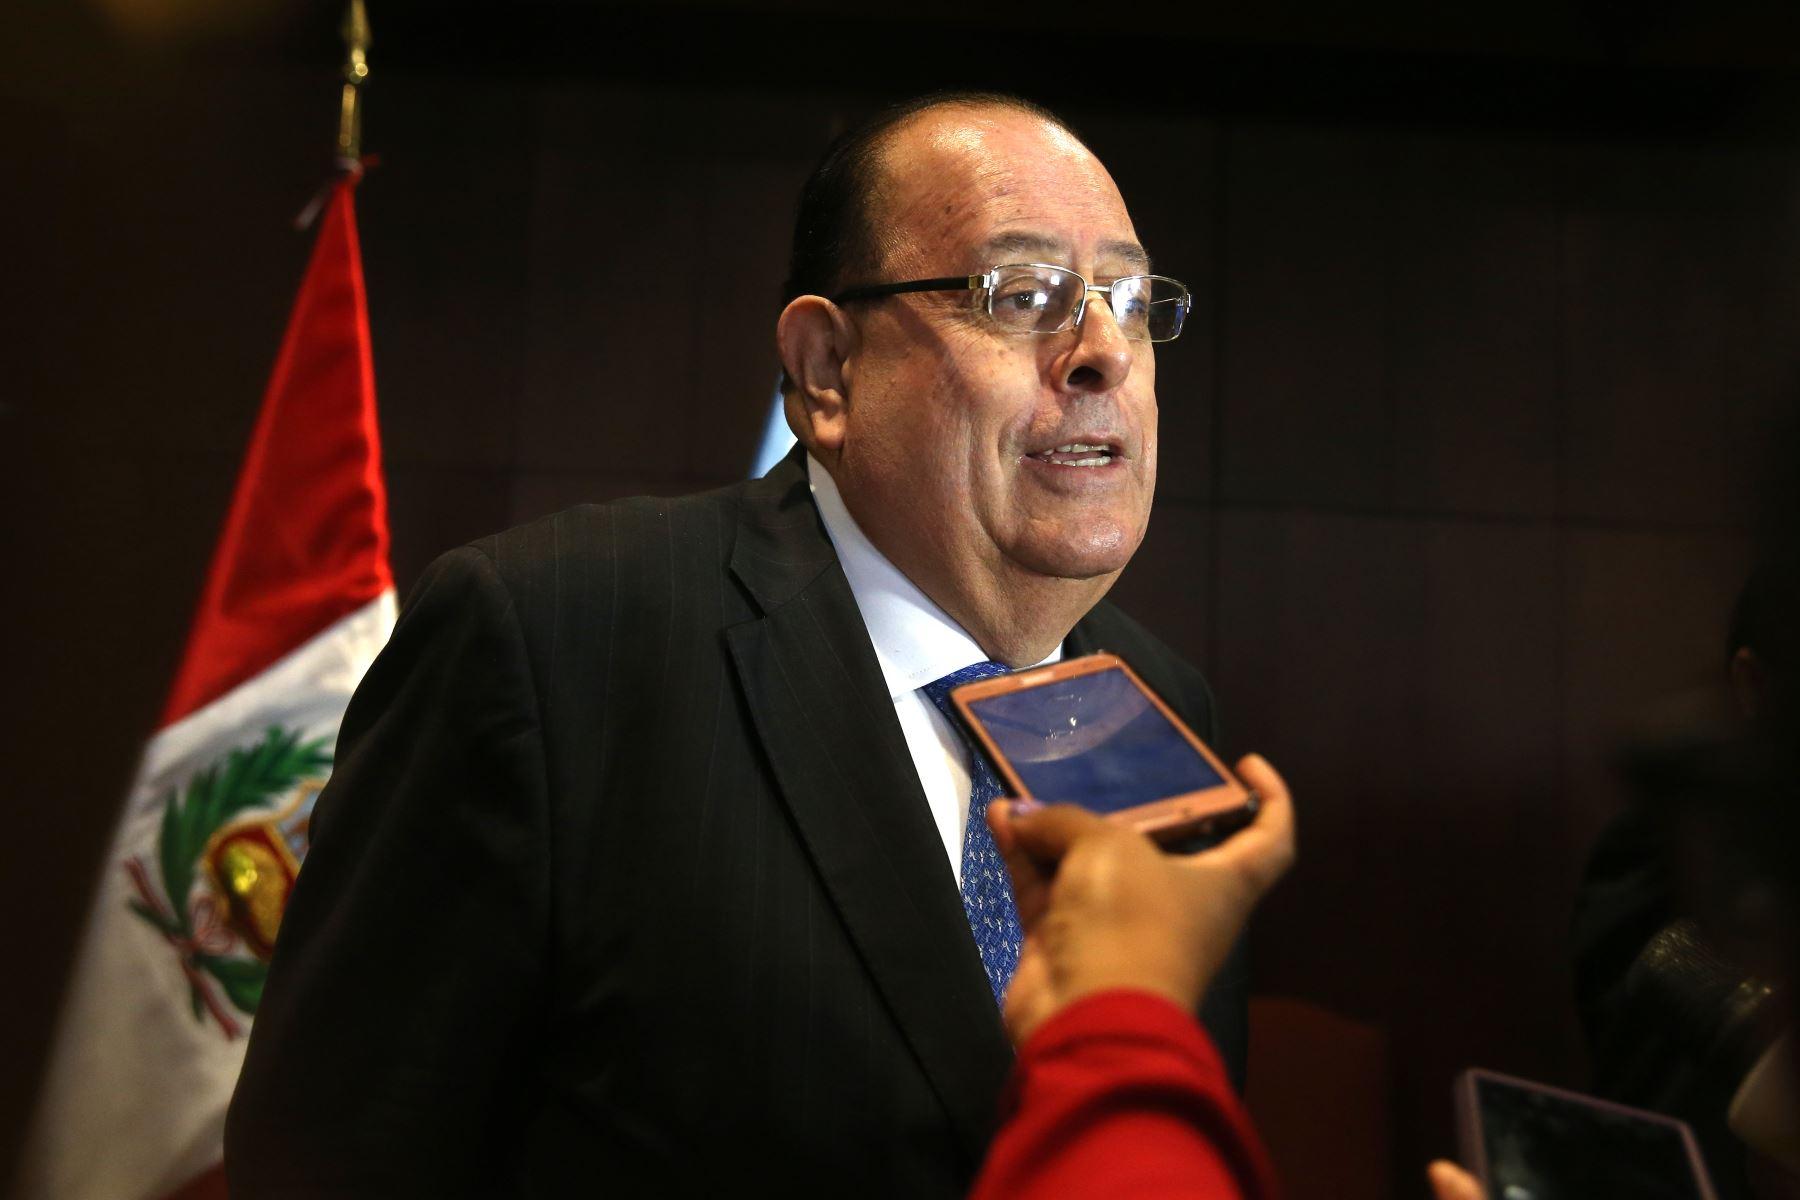 Presidente del Banco Central de Reserva, Julio Velarde. ANDINA/Vidal Tarqui